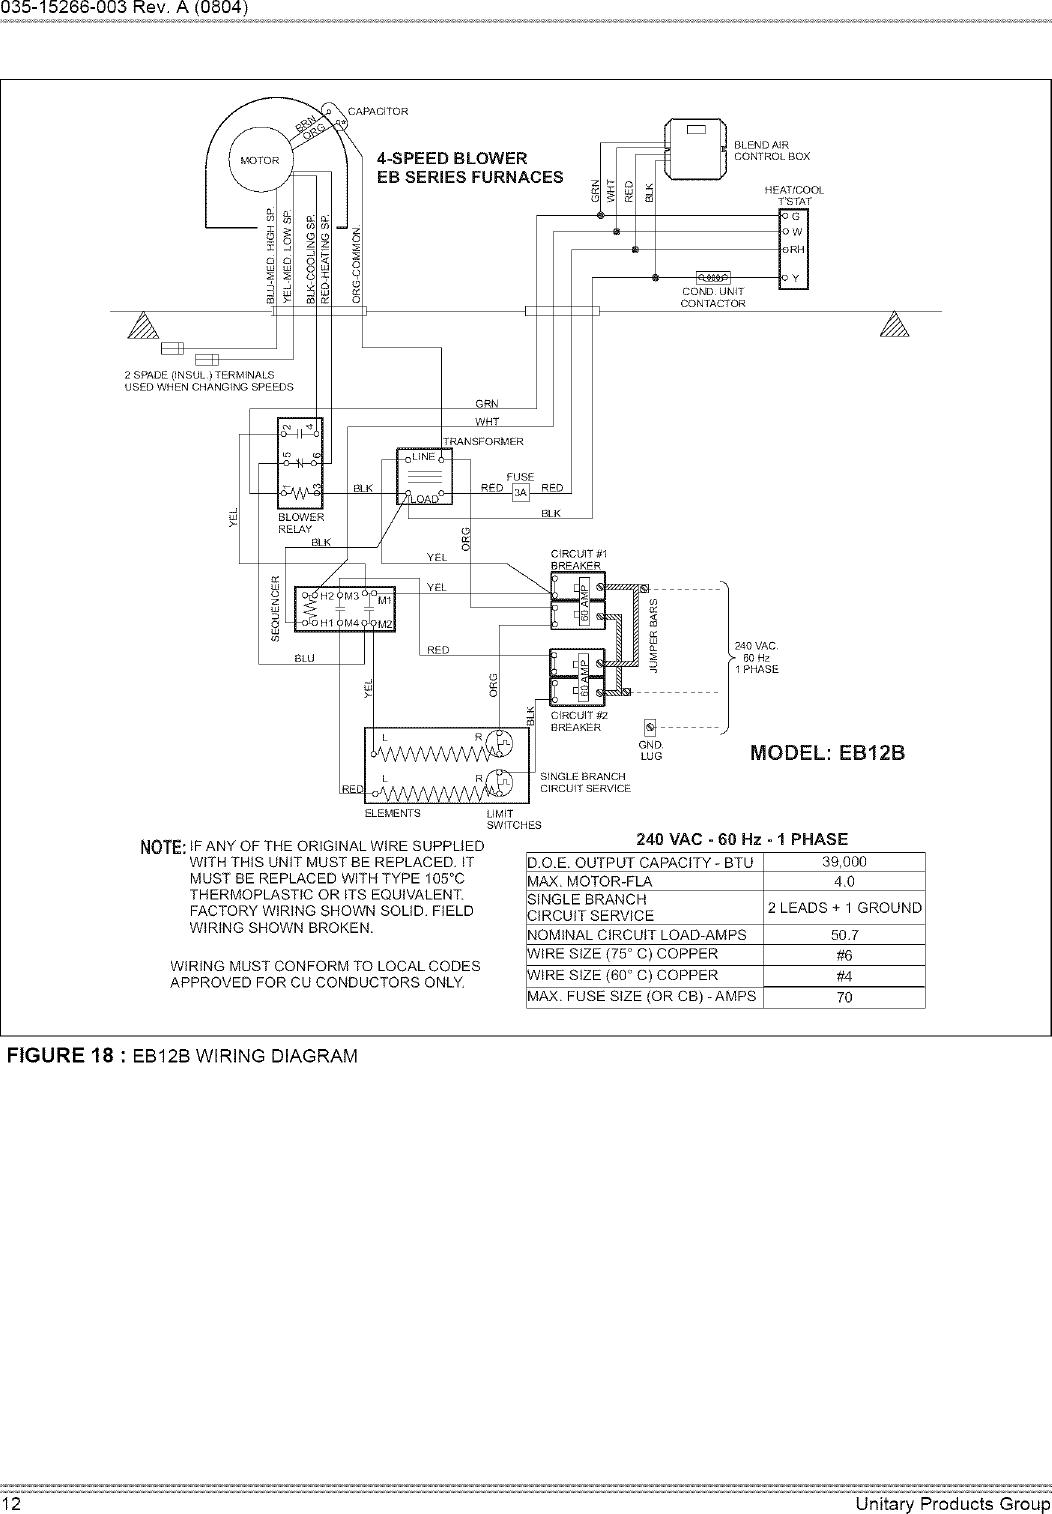 Evcon Eb12b Wiring Diagram   Wiring Diagram on